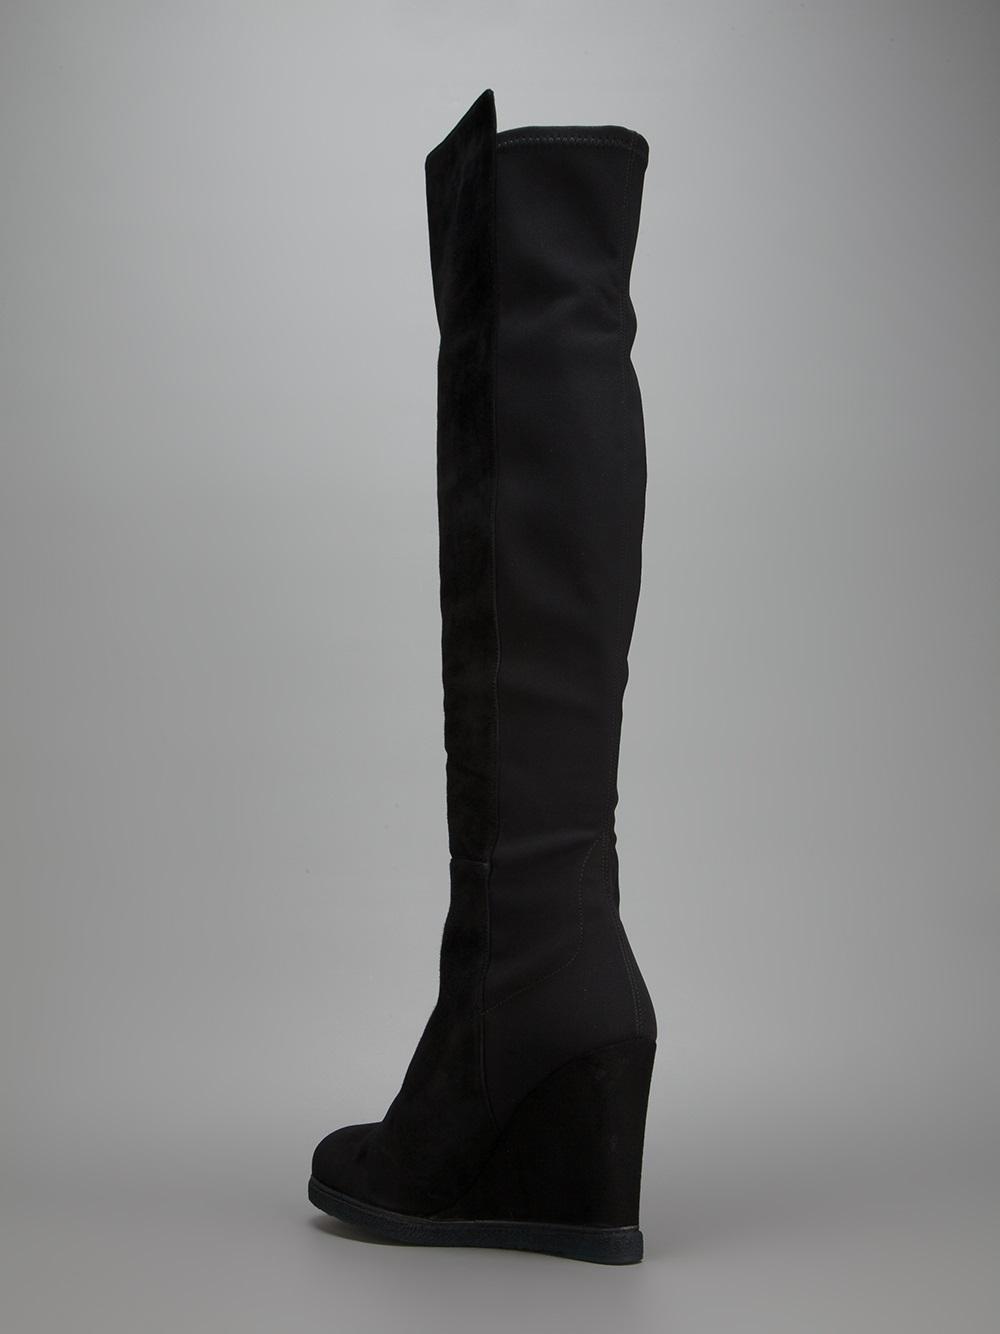 5ac8fc82fb1 Lyst - Stuart Weitzman Demiswoon Wedge Boot in Black